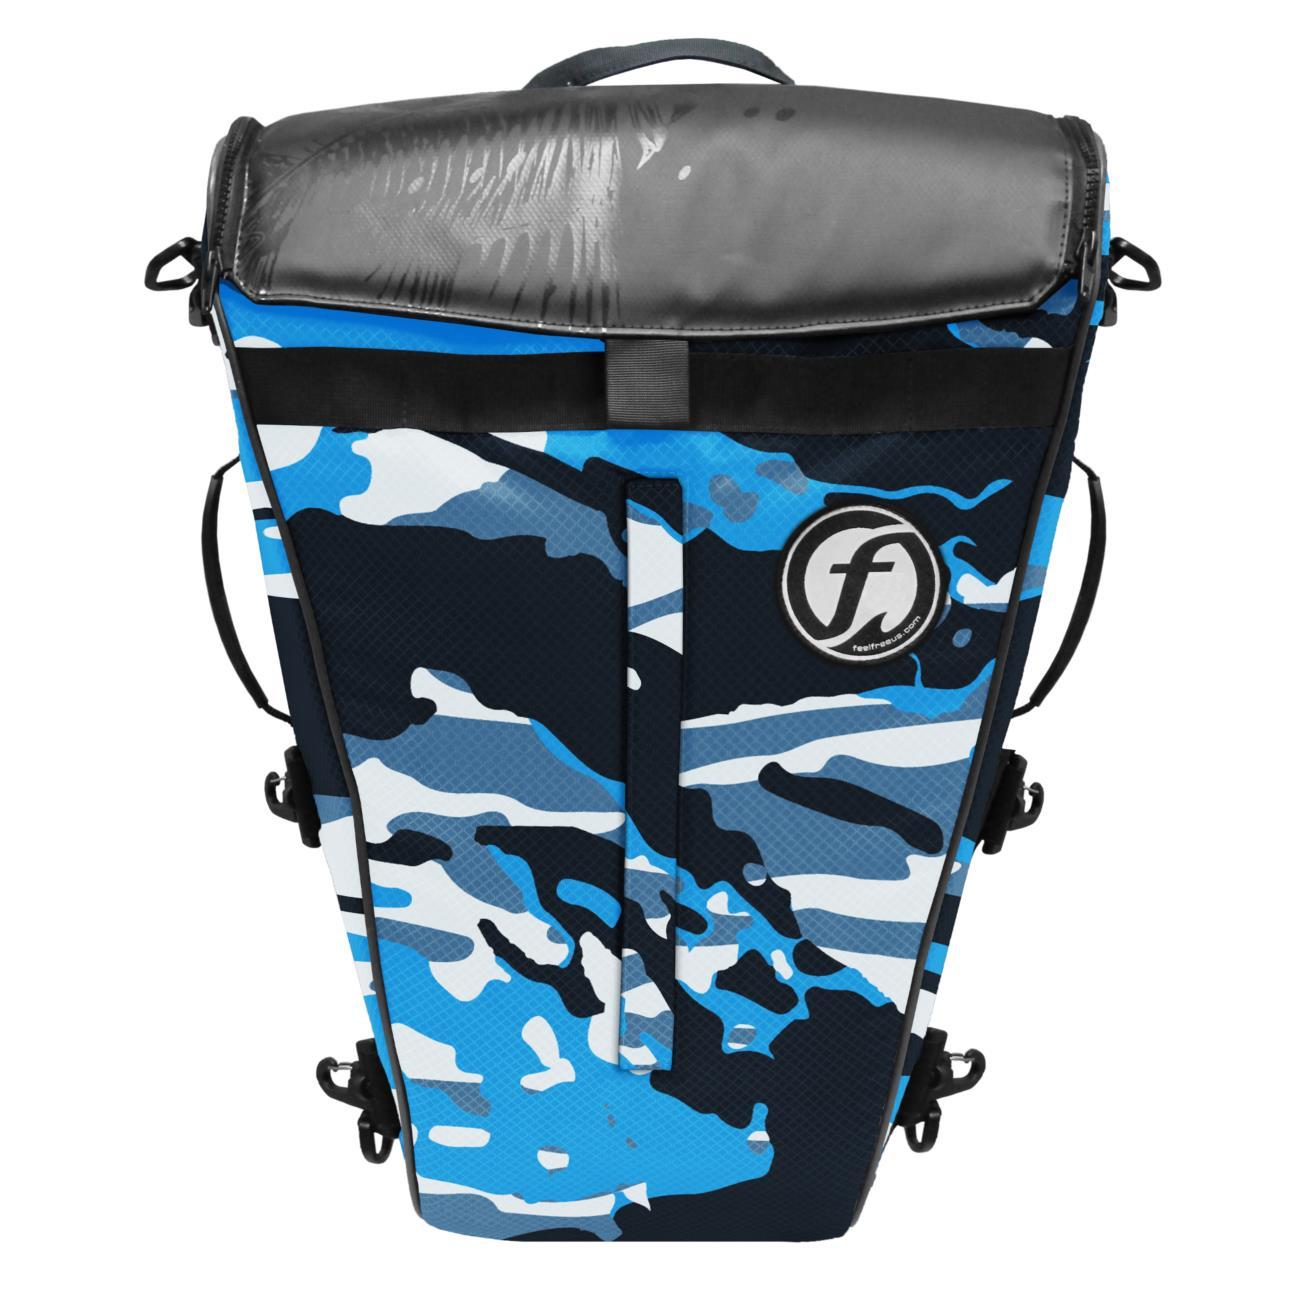 https://feelfreekayak.eu/943-small_default/fish-bag-l-blue-camo.jpg